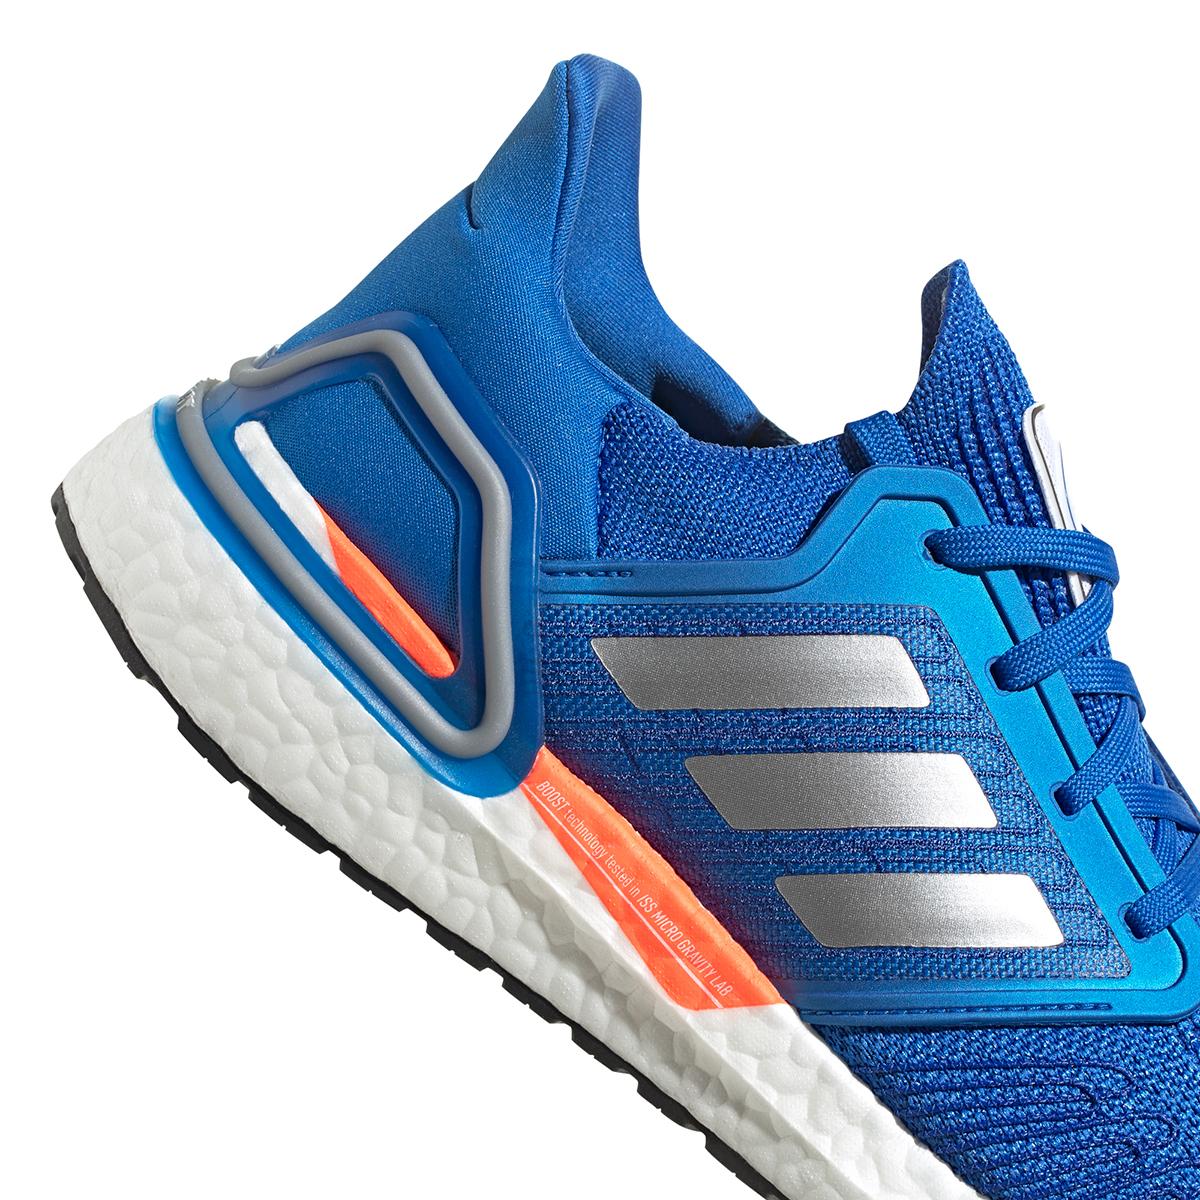 Men's Adidas Ultraboost 20 Running Shoe - Color: Football Blue - Size: 5 - Width: Regular, Football Blue, large, image 4